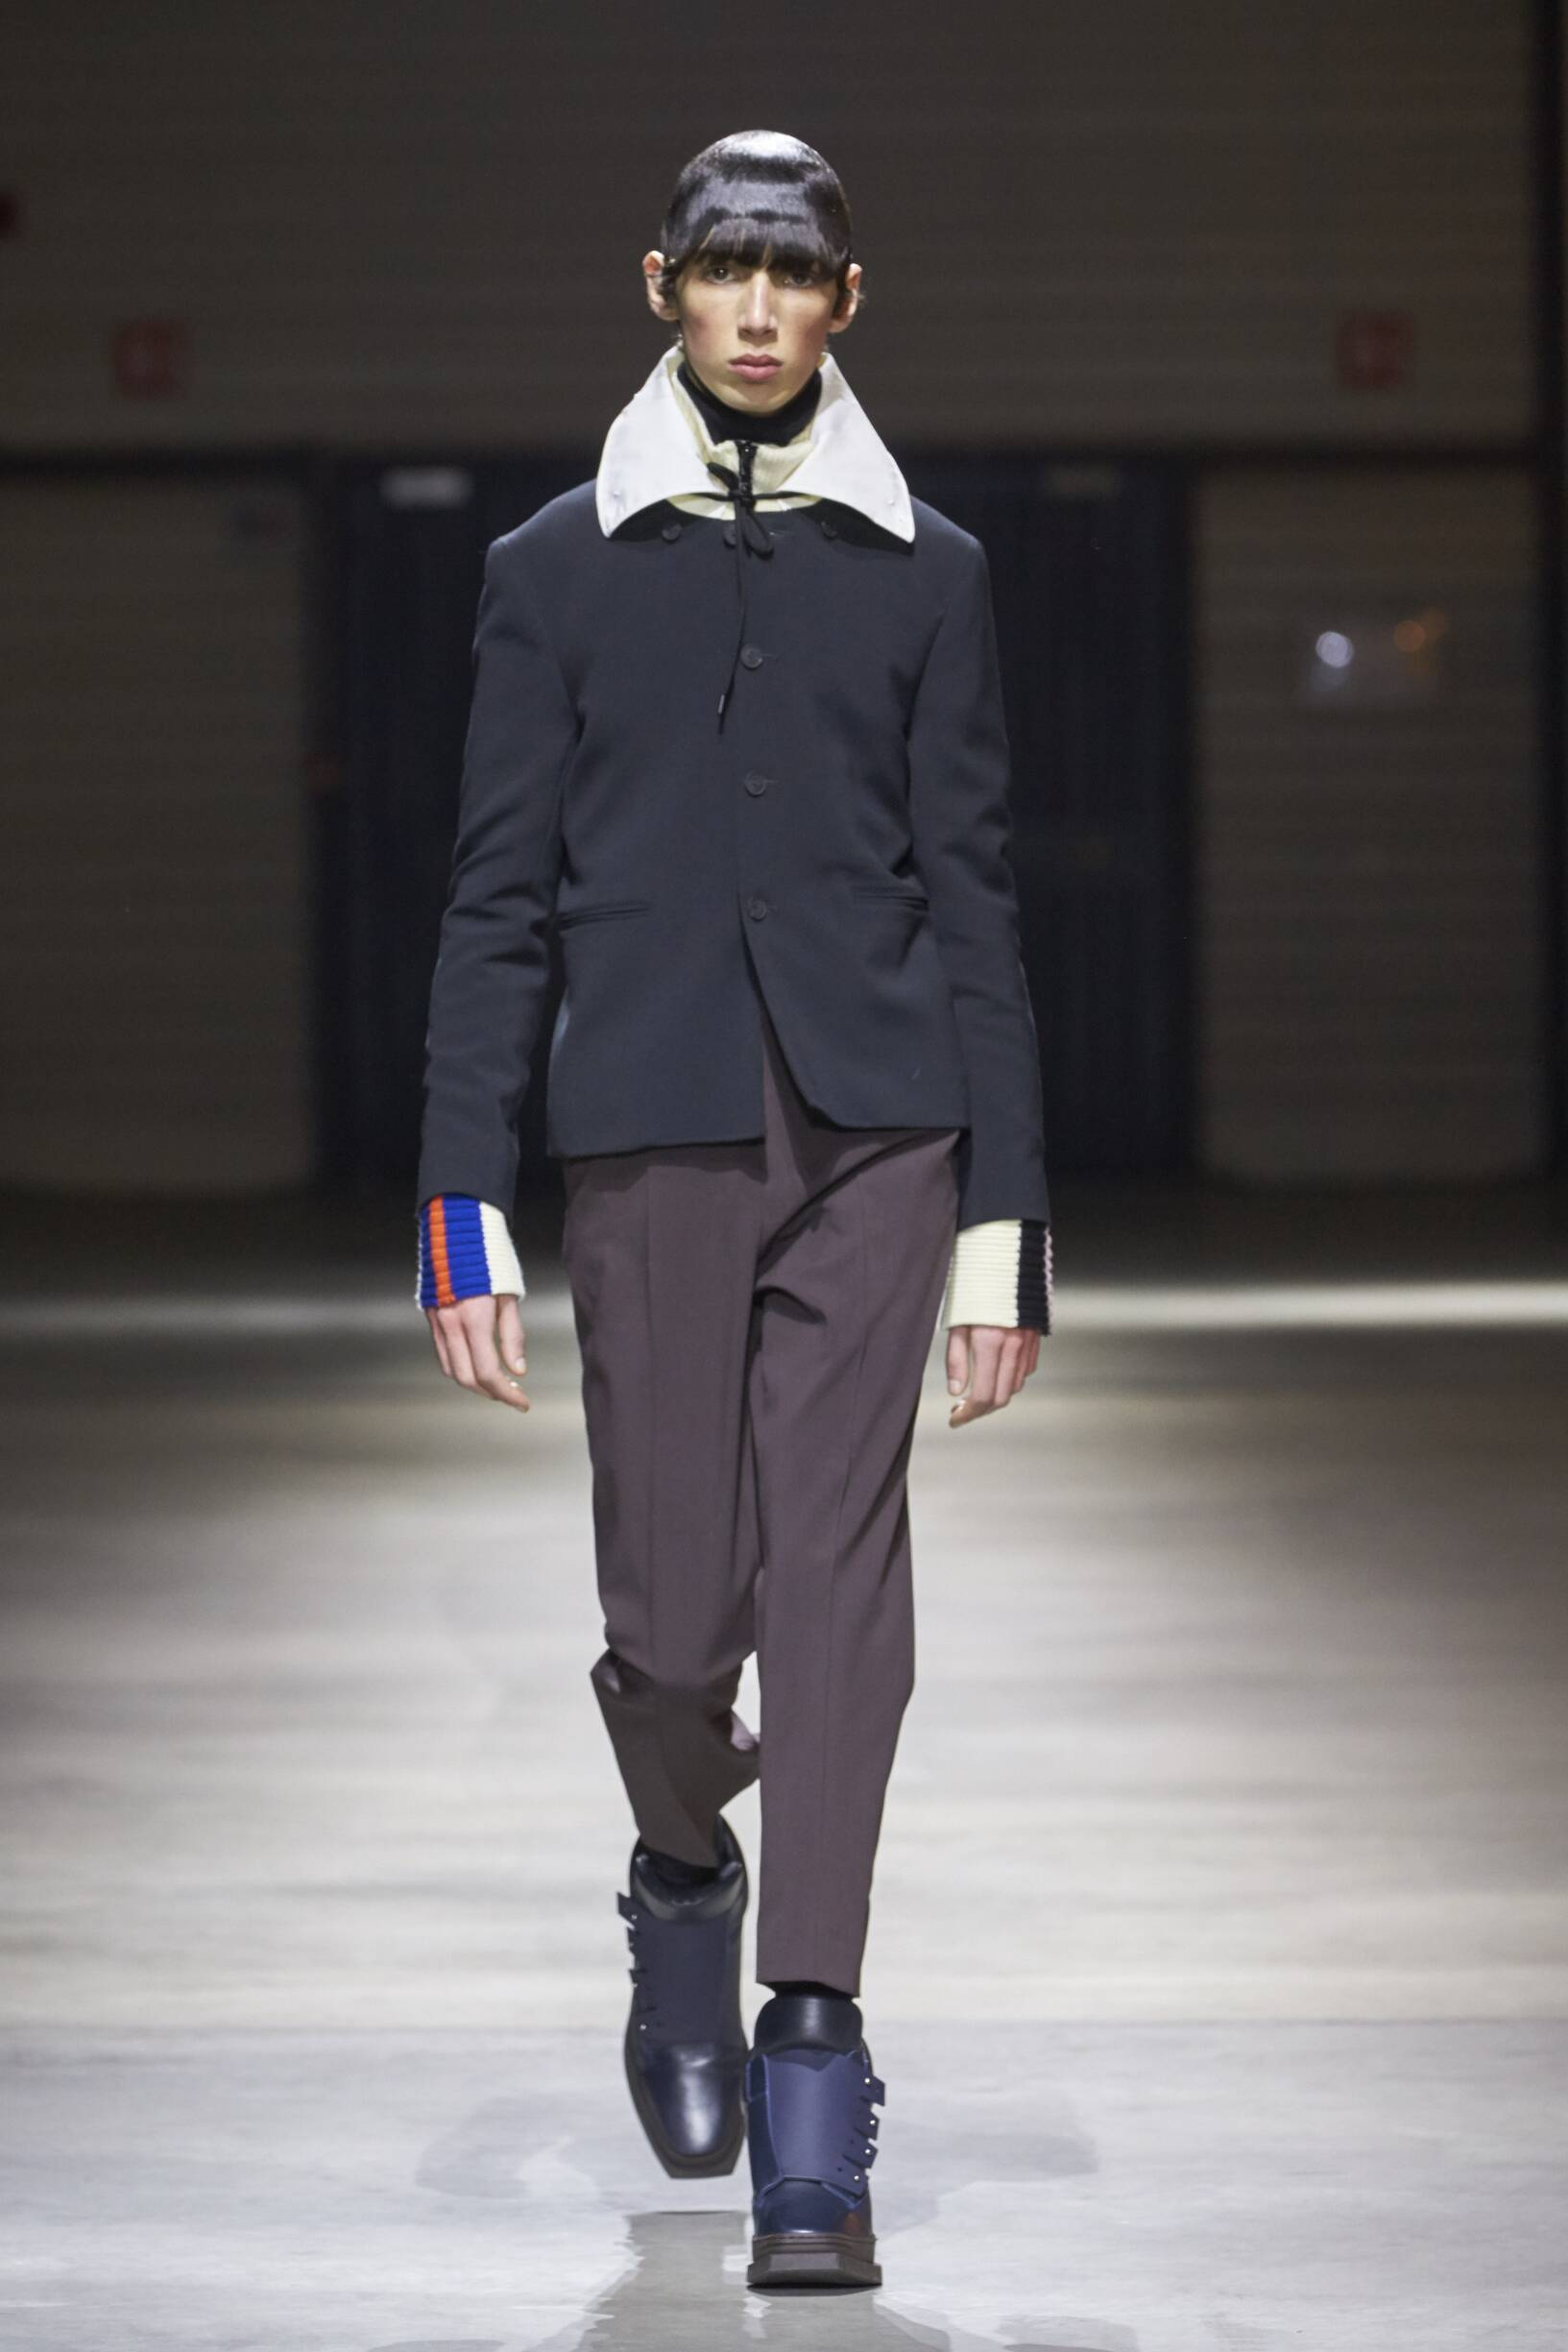 2017 Catwalk Kenzo Man Fashion Show Winter